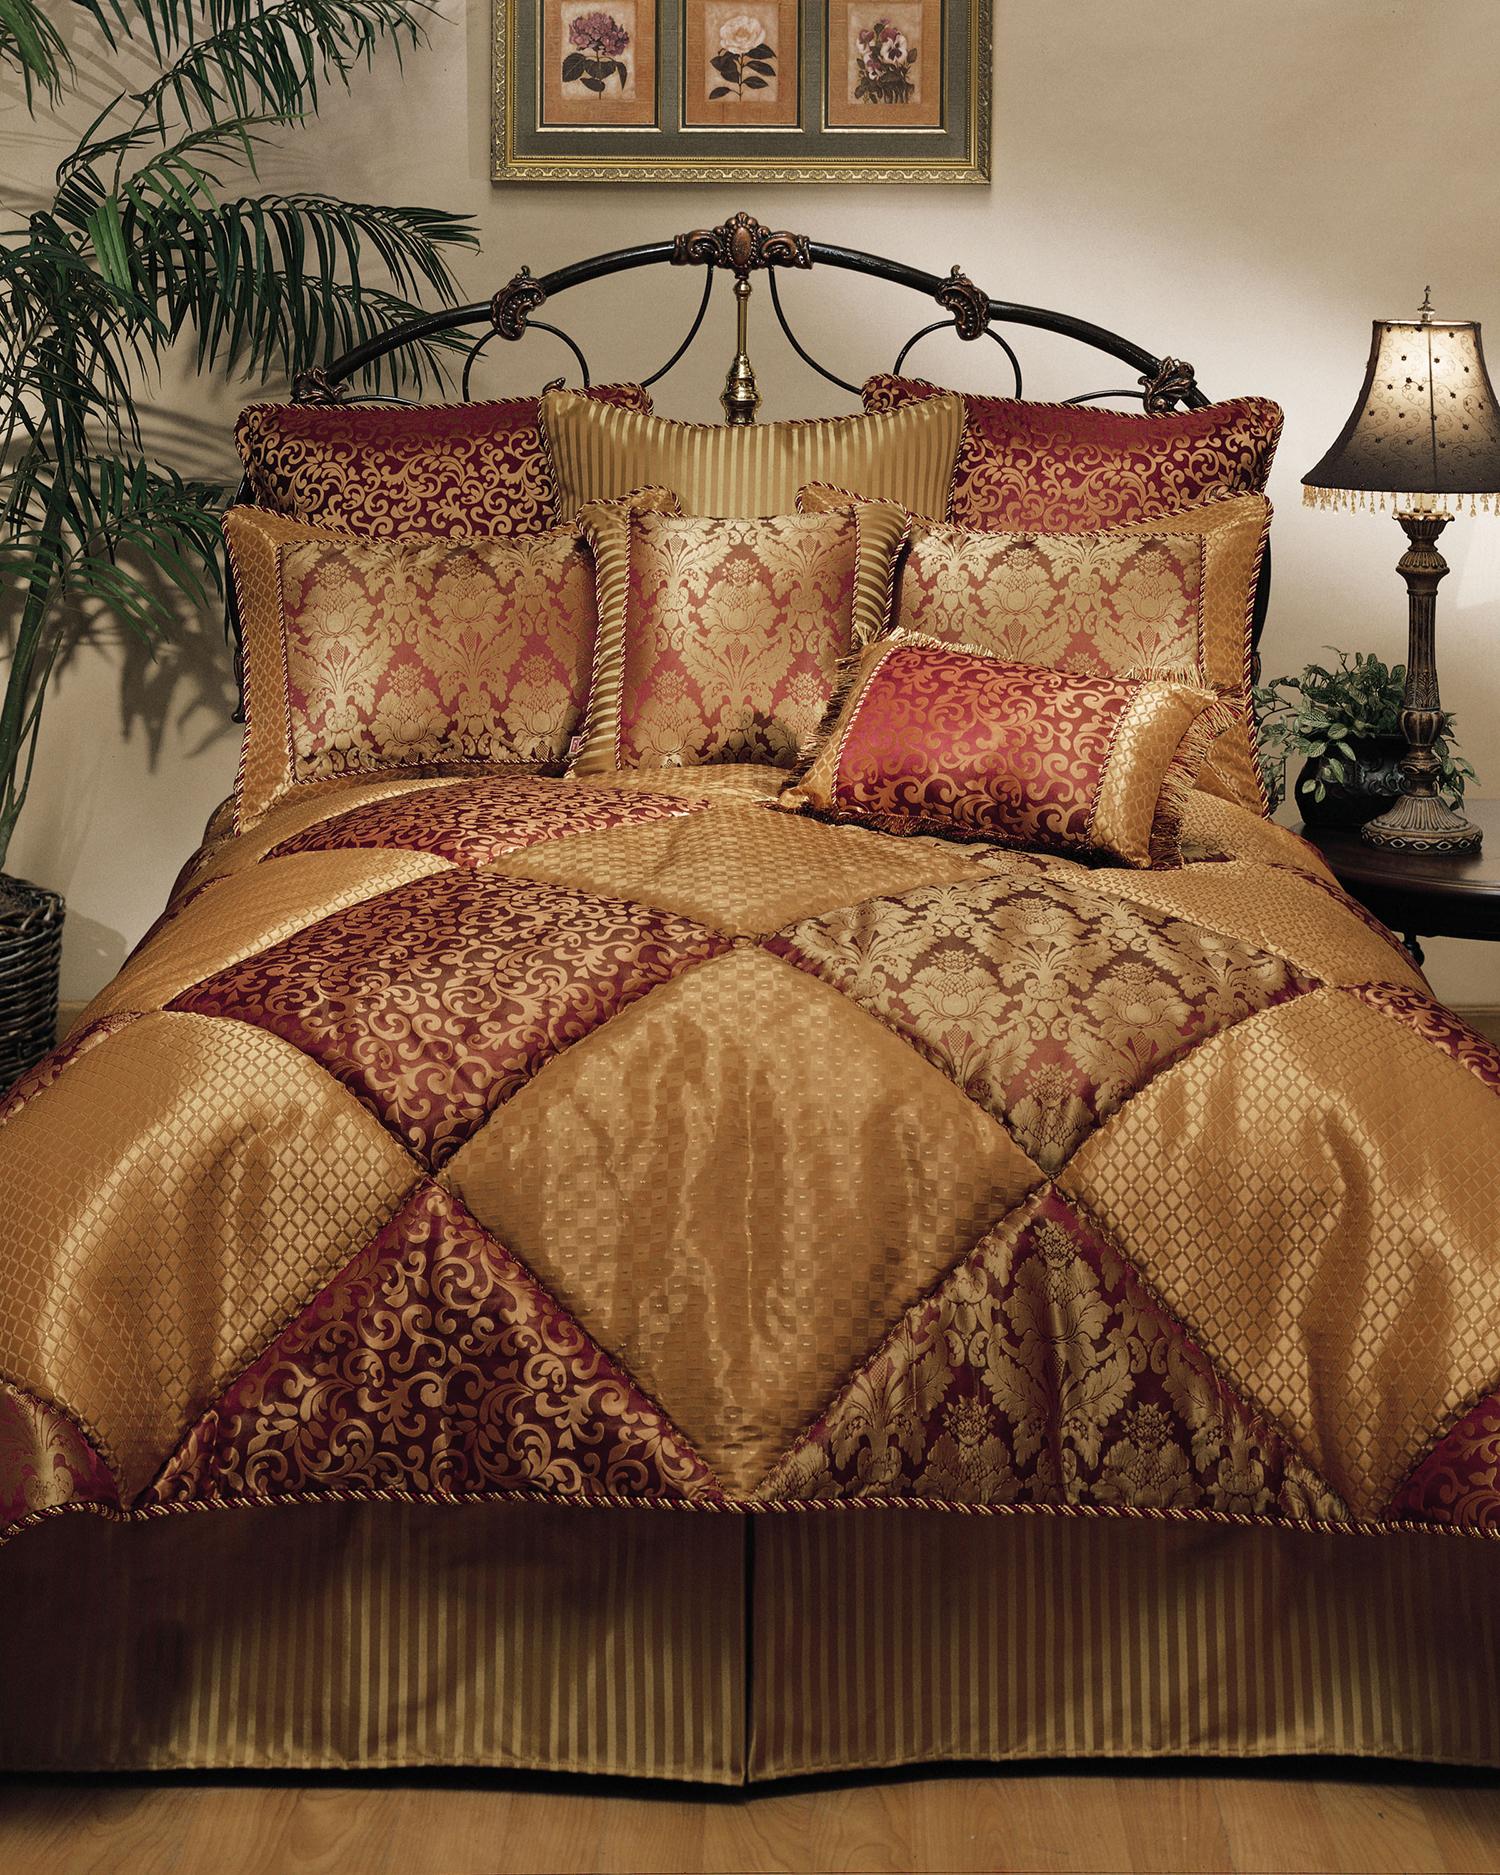 Cheateau Royale By Sherry Kline Beddingsuperstore Com